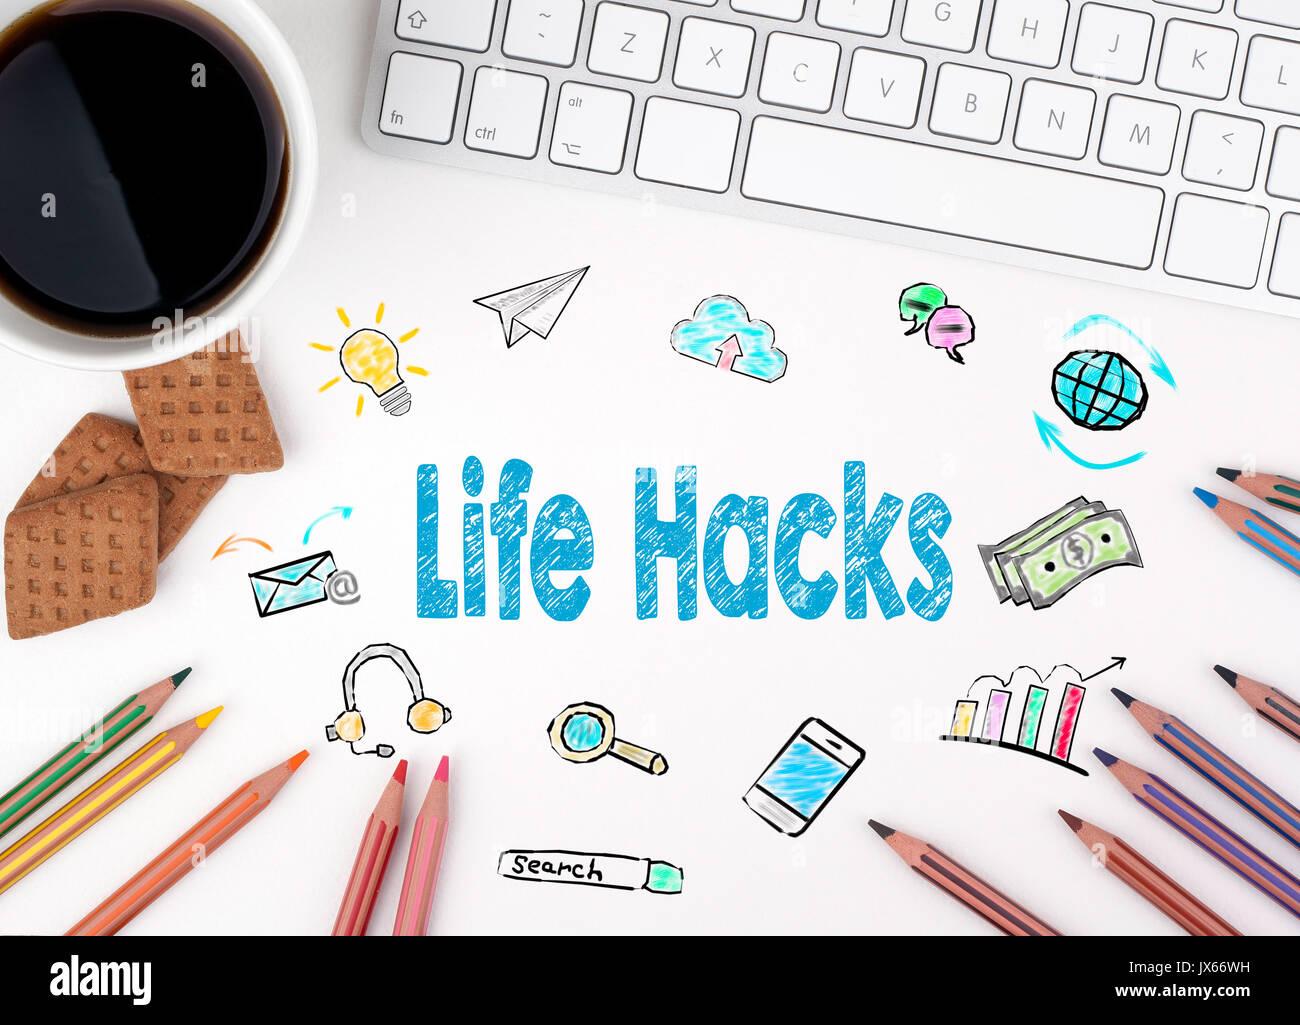 Life Hacks. Computer keyboard and a coffee mug on a white table - Stock Image